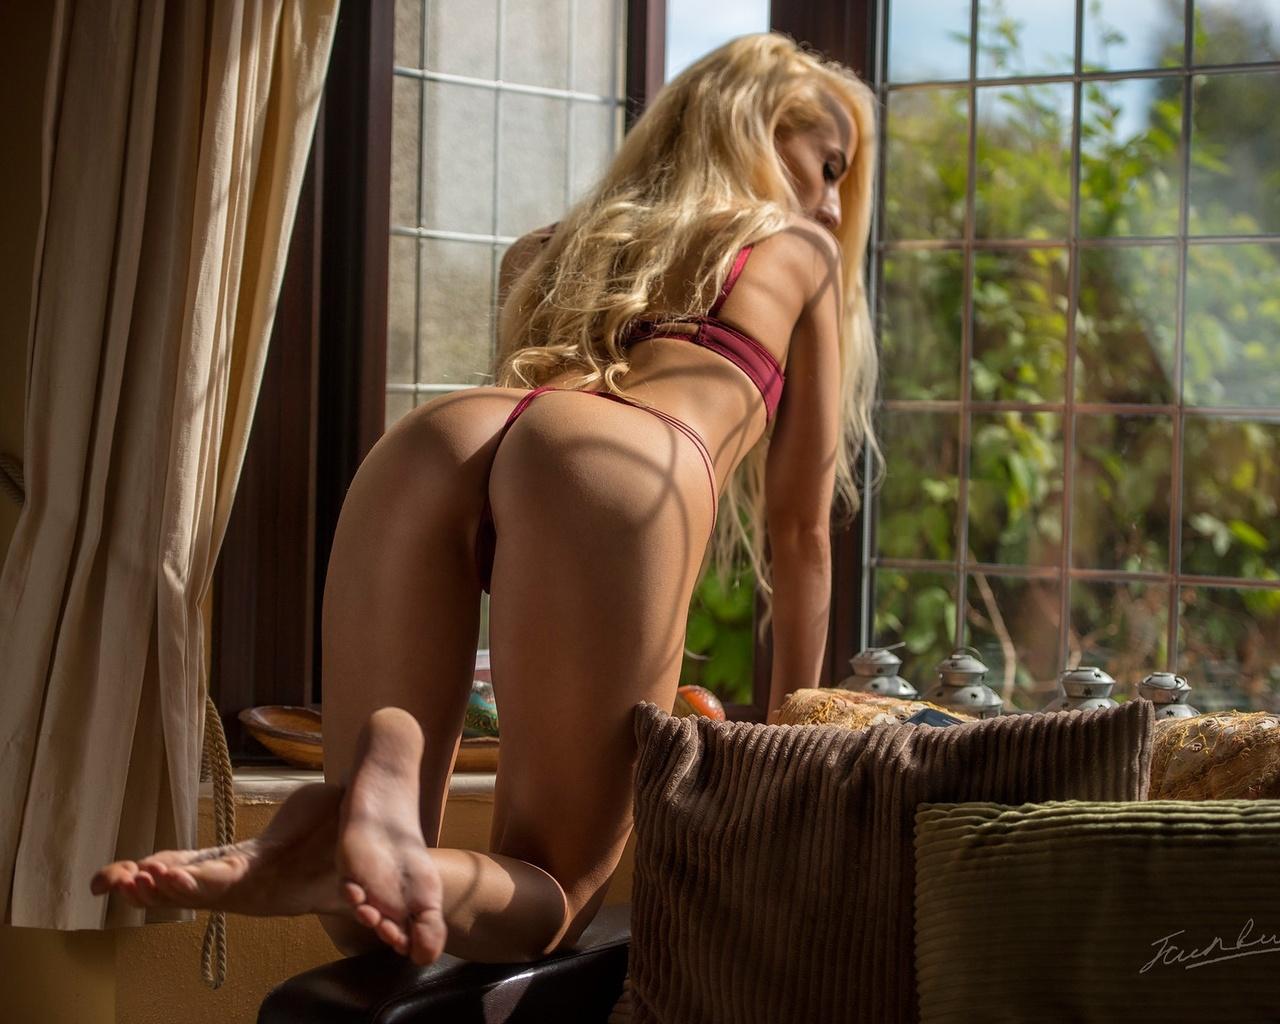 блондинка, поза, попа, окно, jack russell